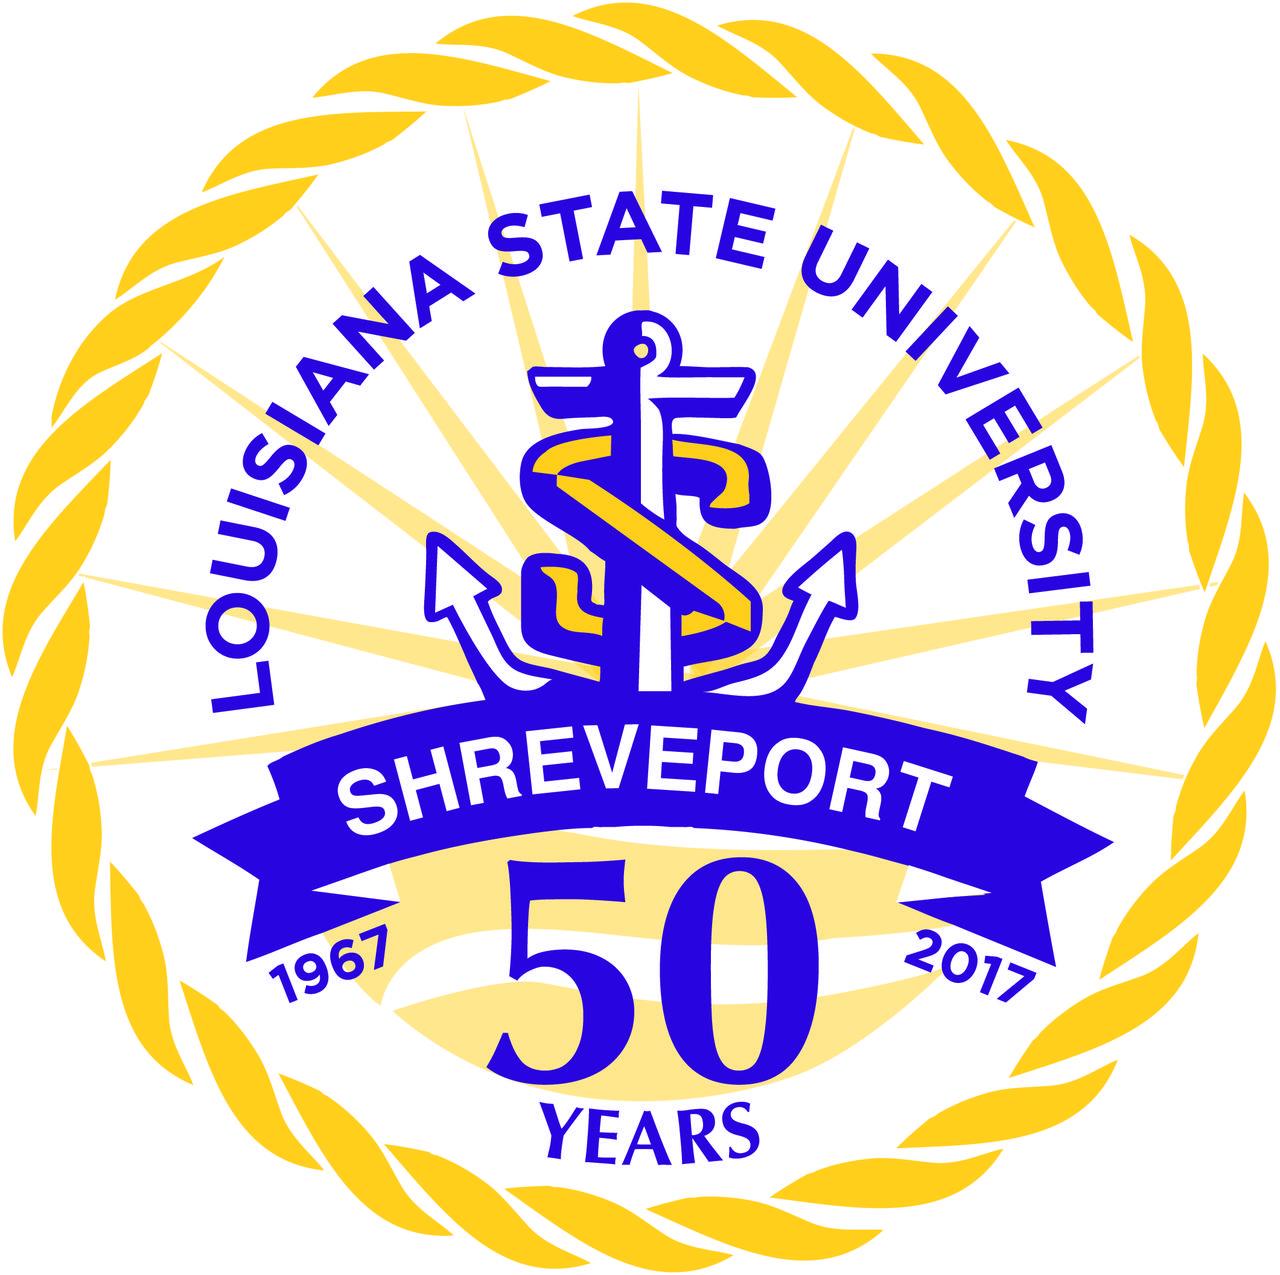 LSUS Celebrates 50 Years!